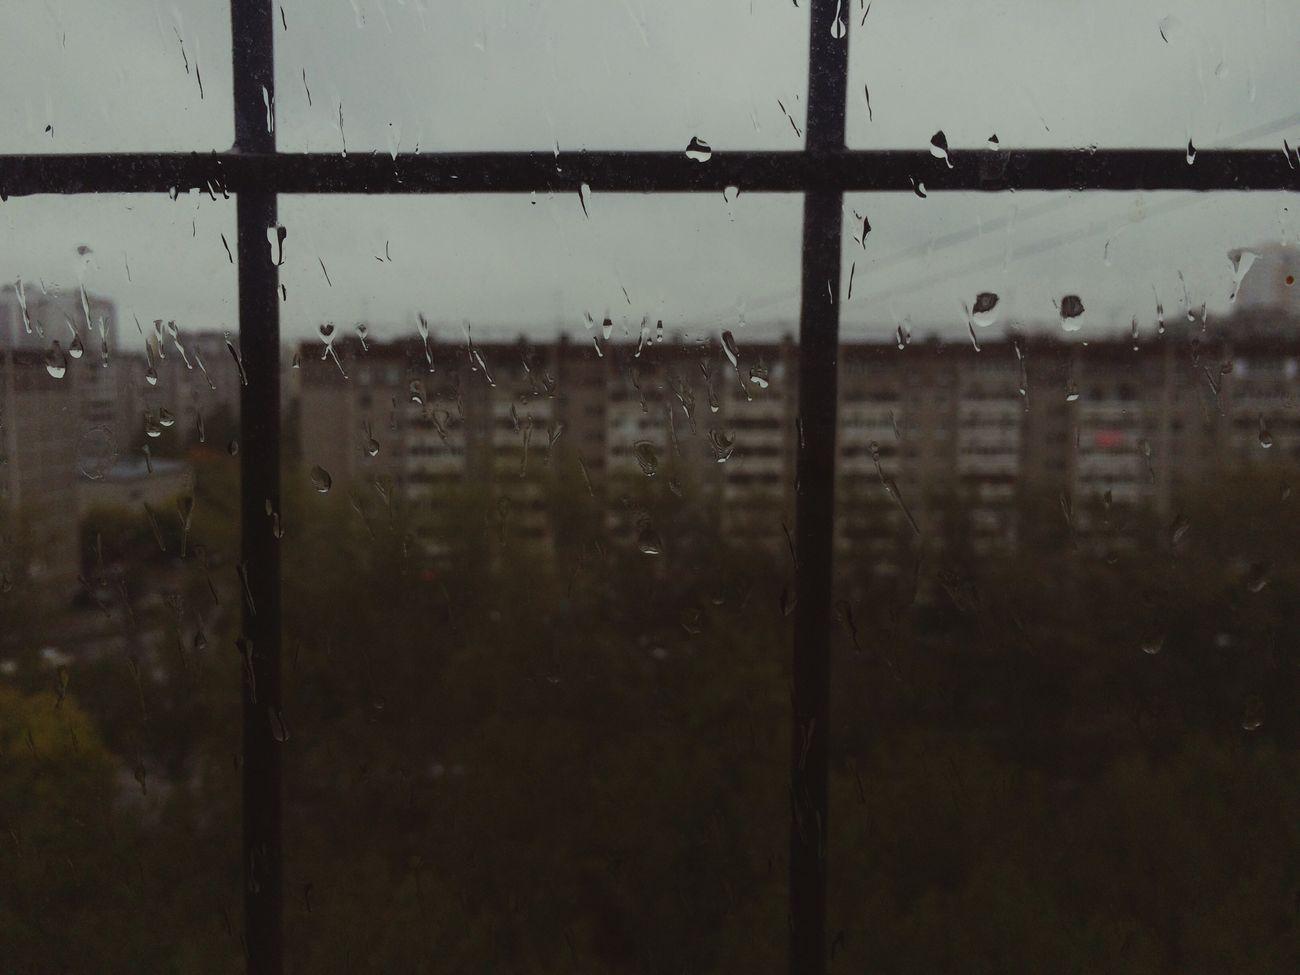 Rain Window Focus On Foreground Water Drop Weather Rainy Season Wet RainDrop No People